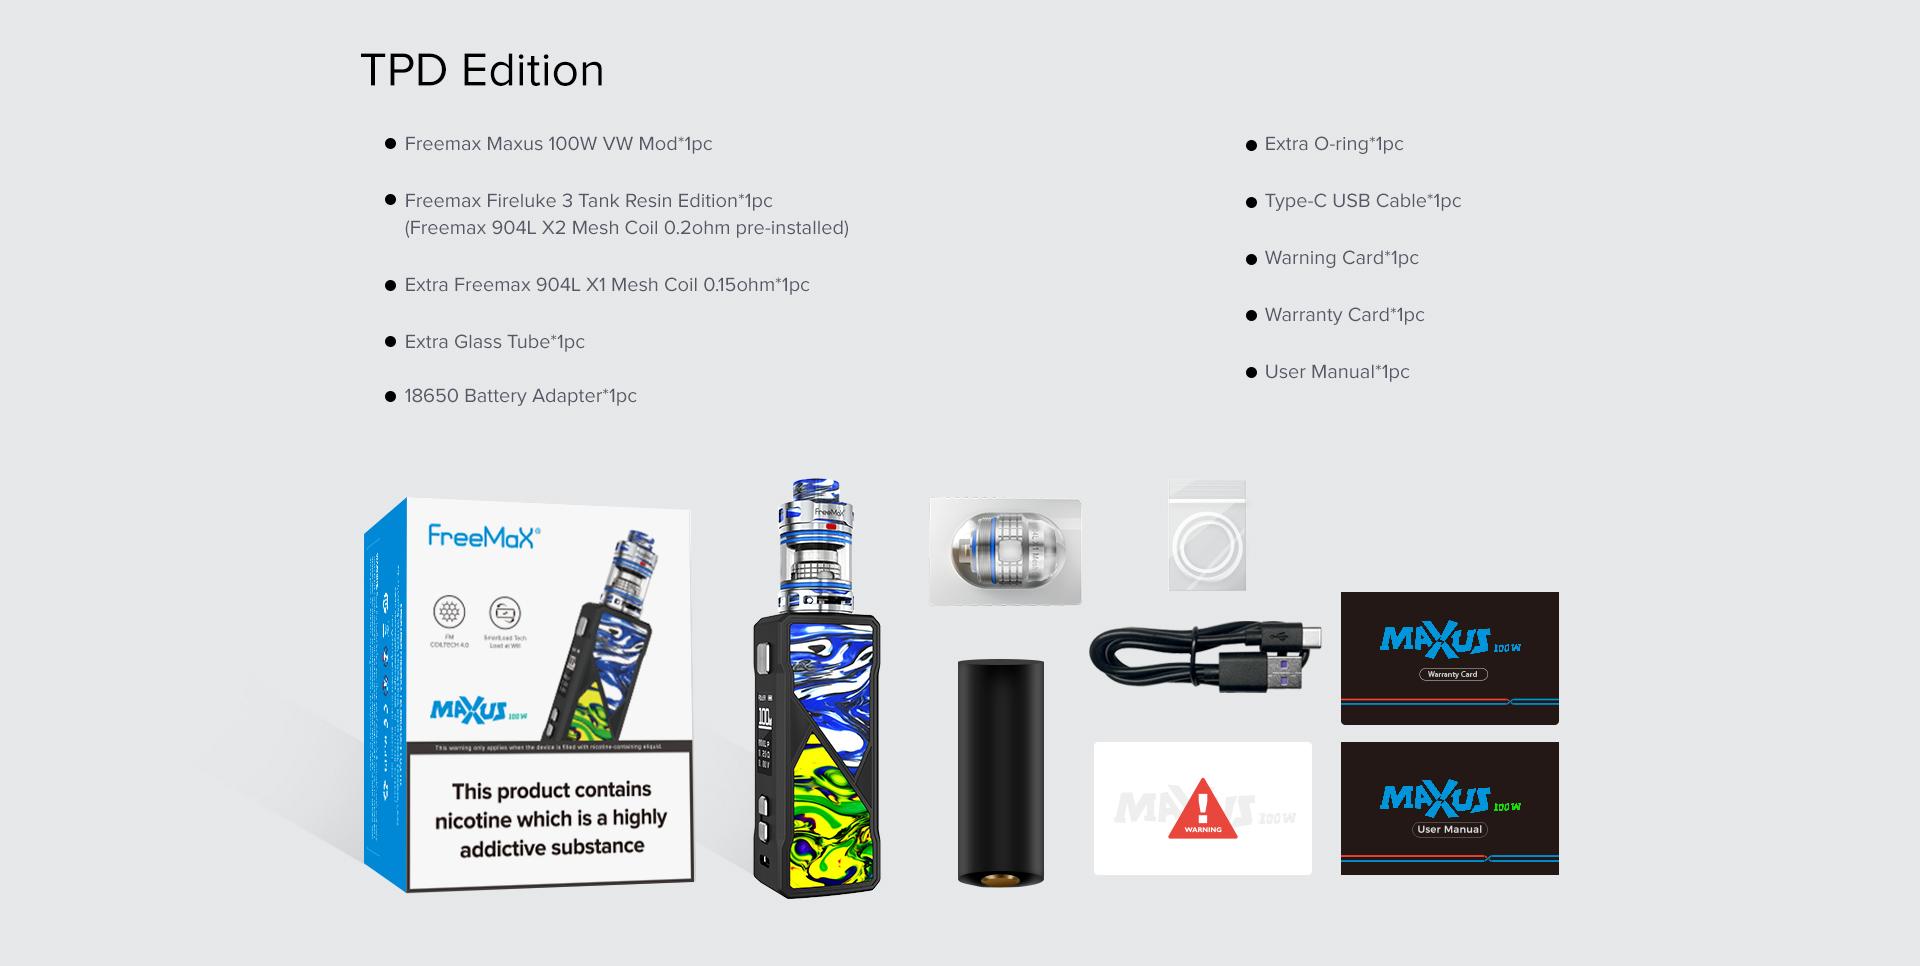 Freemax Maxus 100W Kit Contents